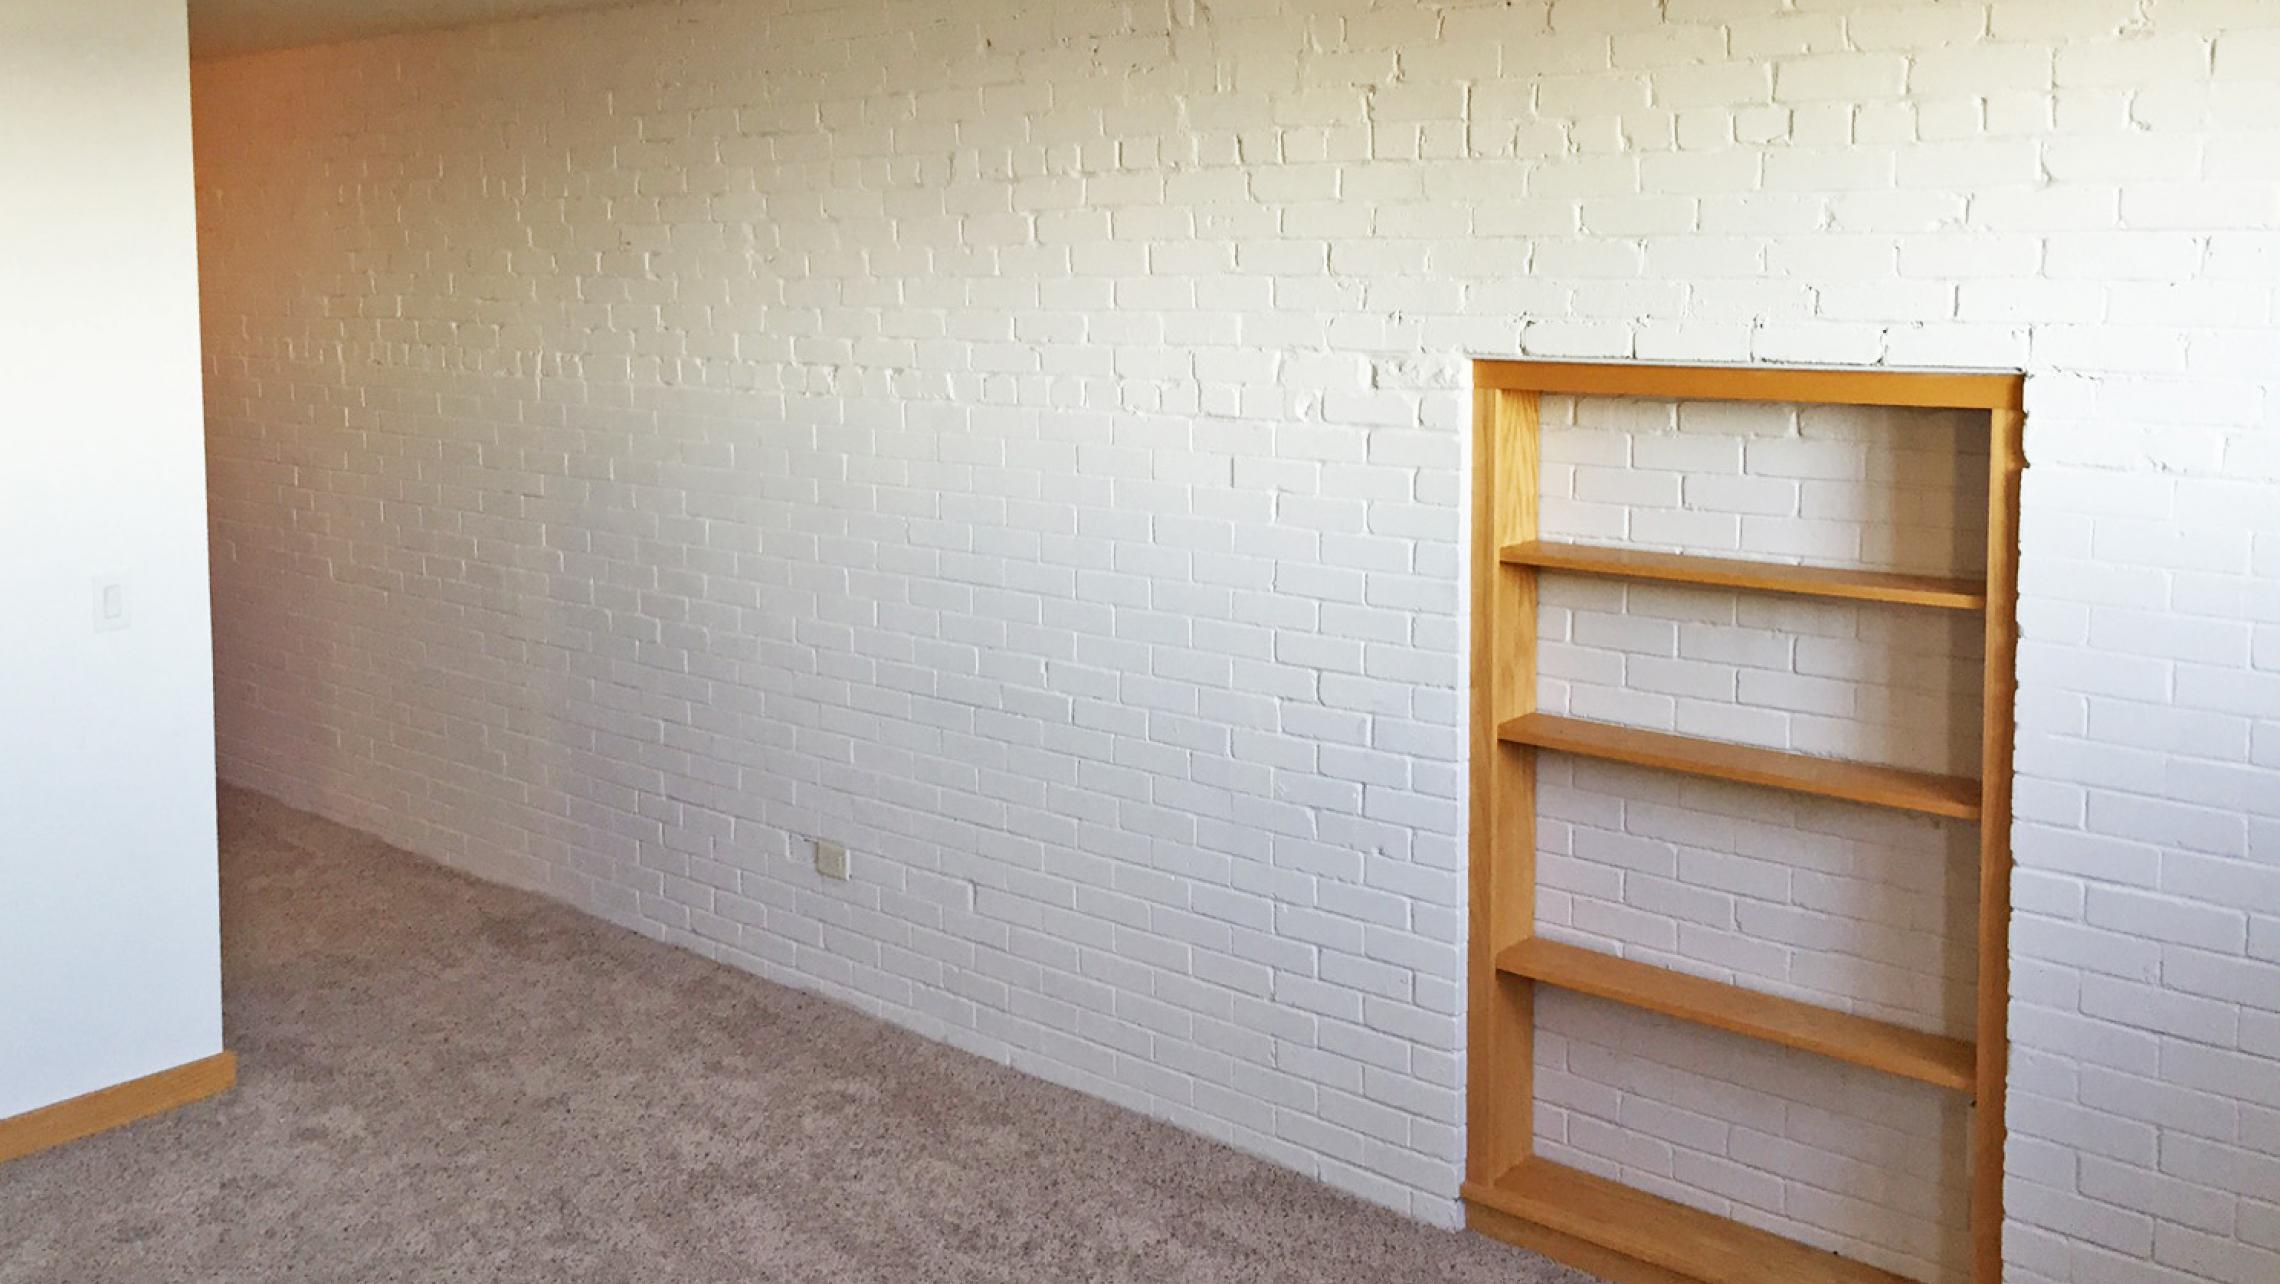 ULI Lincoln School Apartment 205 - Historic Detail